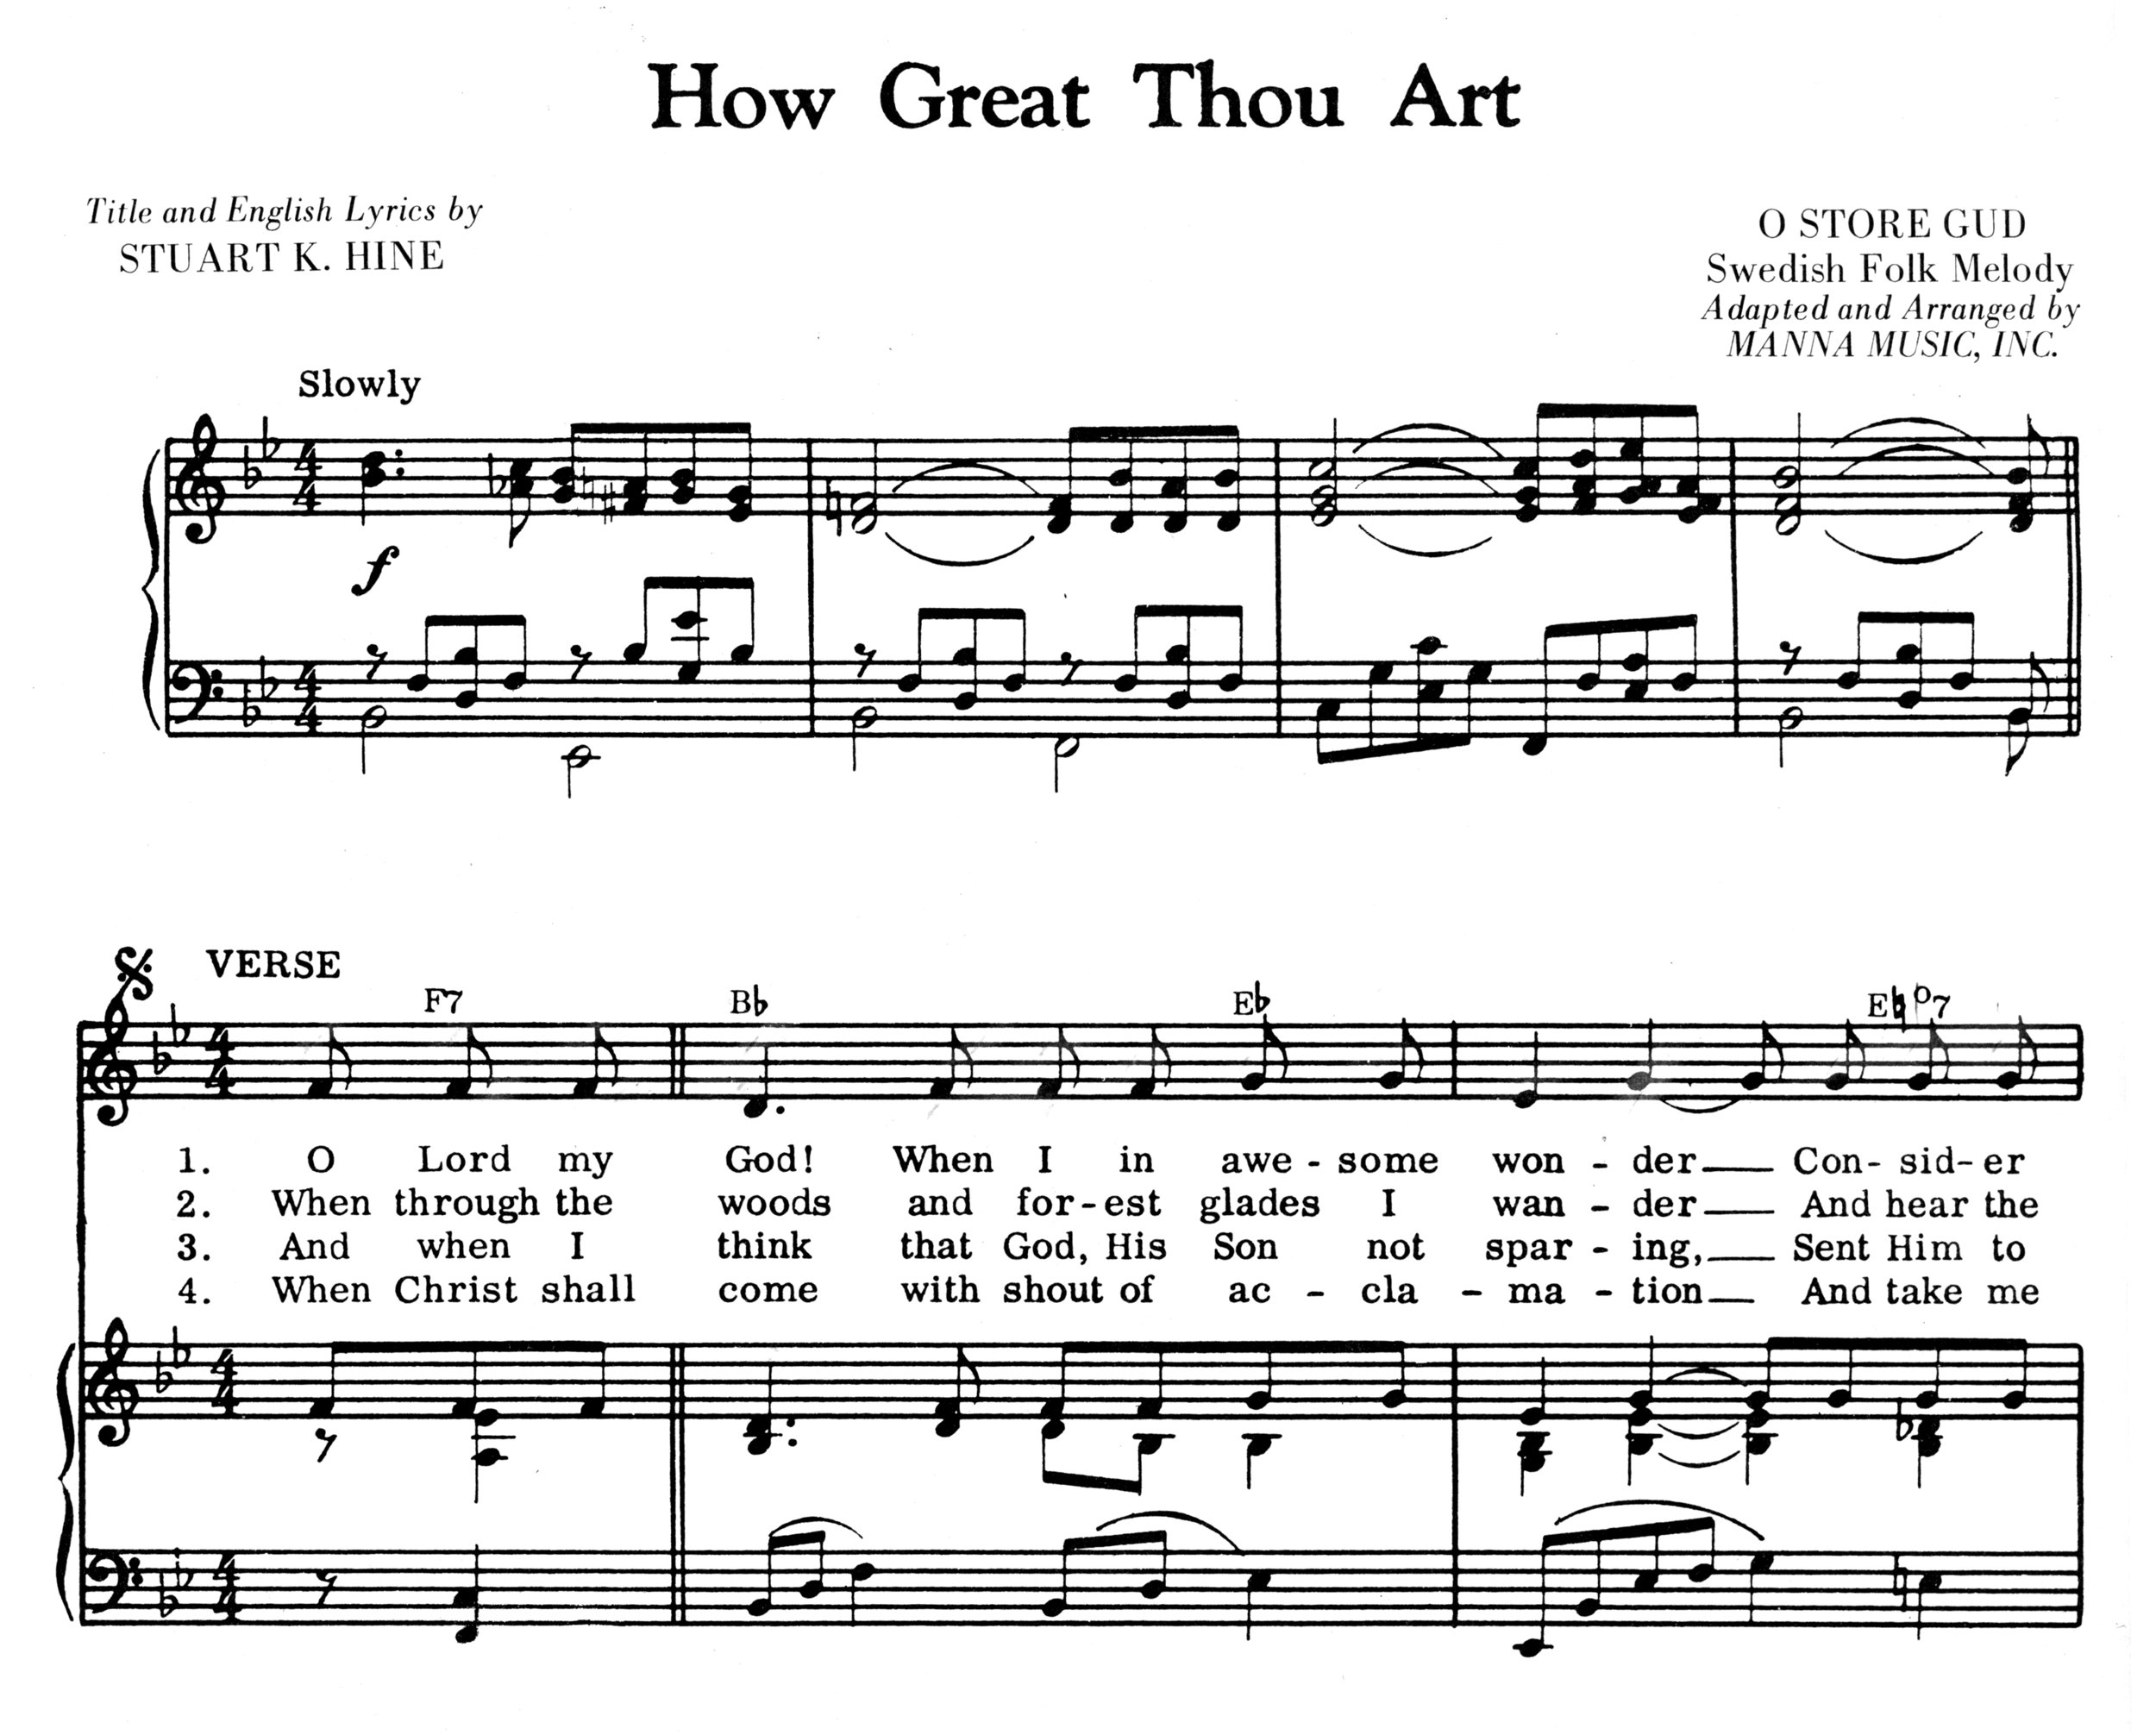 HowGreatThouArt01-1955a.jpg